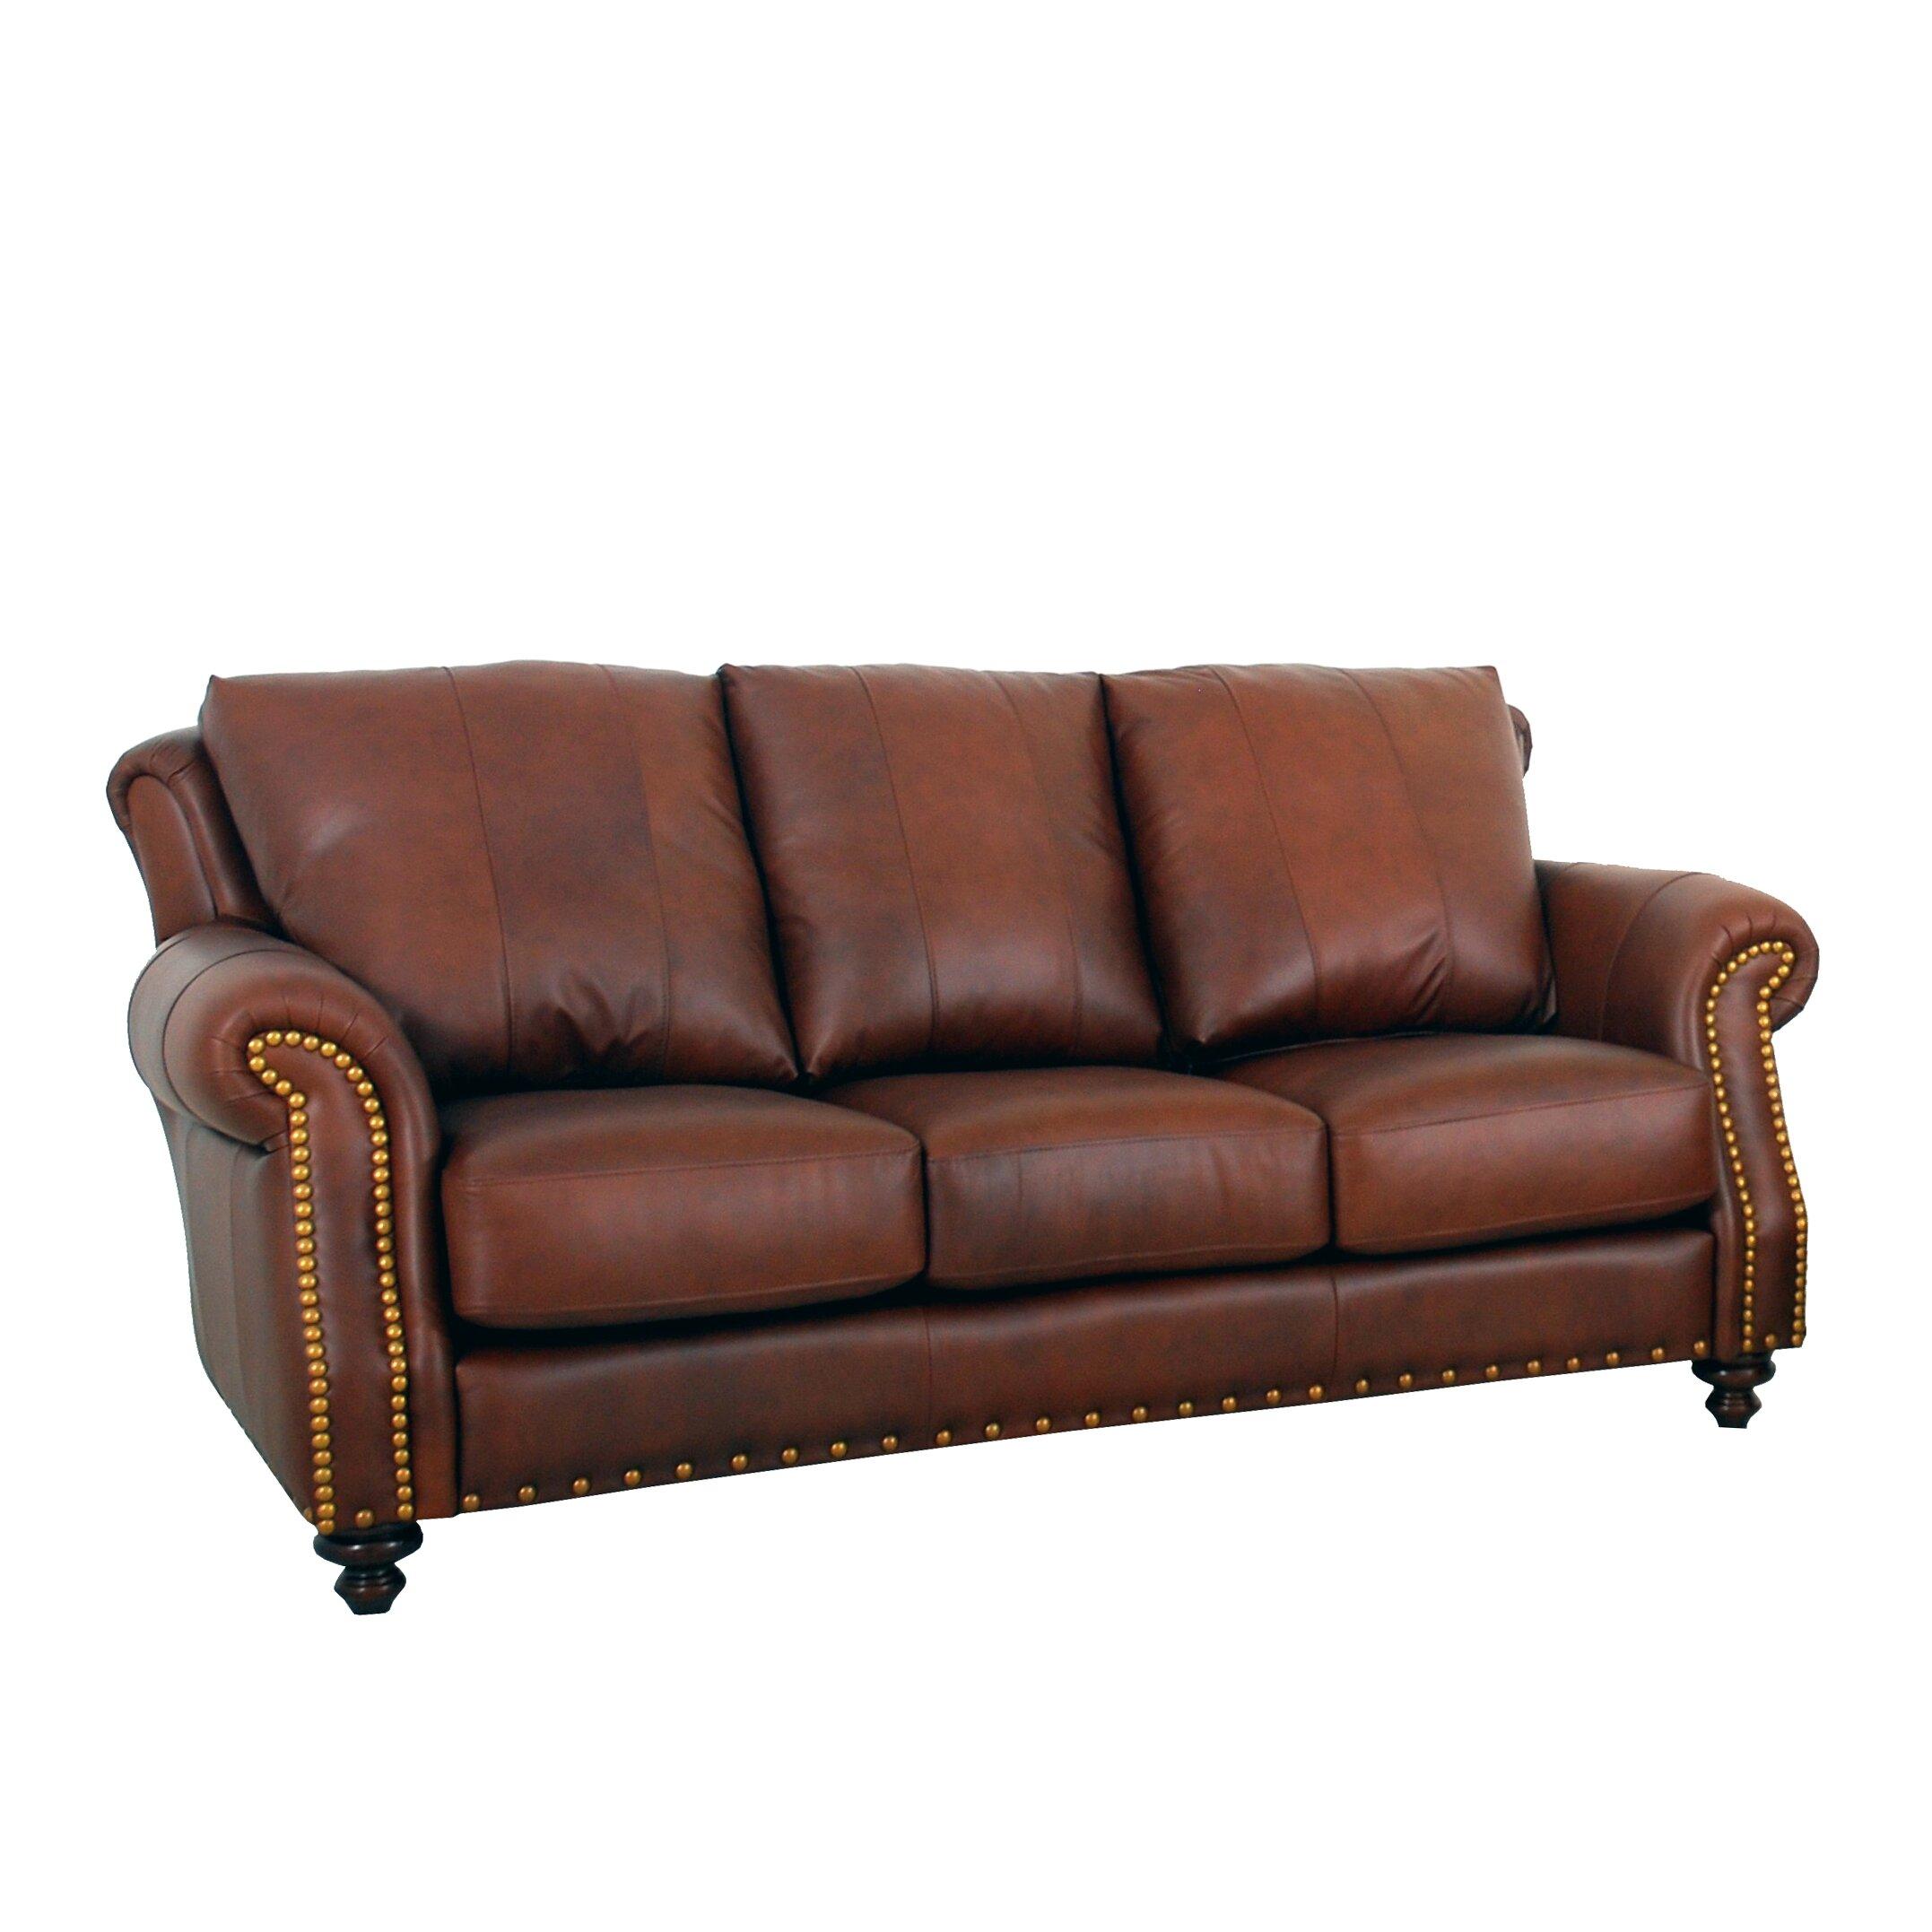 Westland And Birch Randolph Leather Sofa